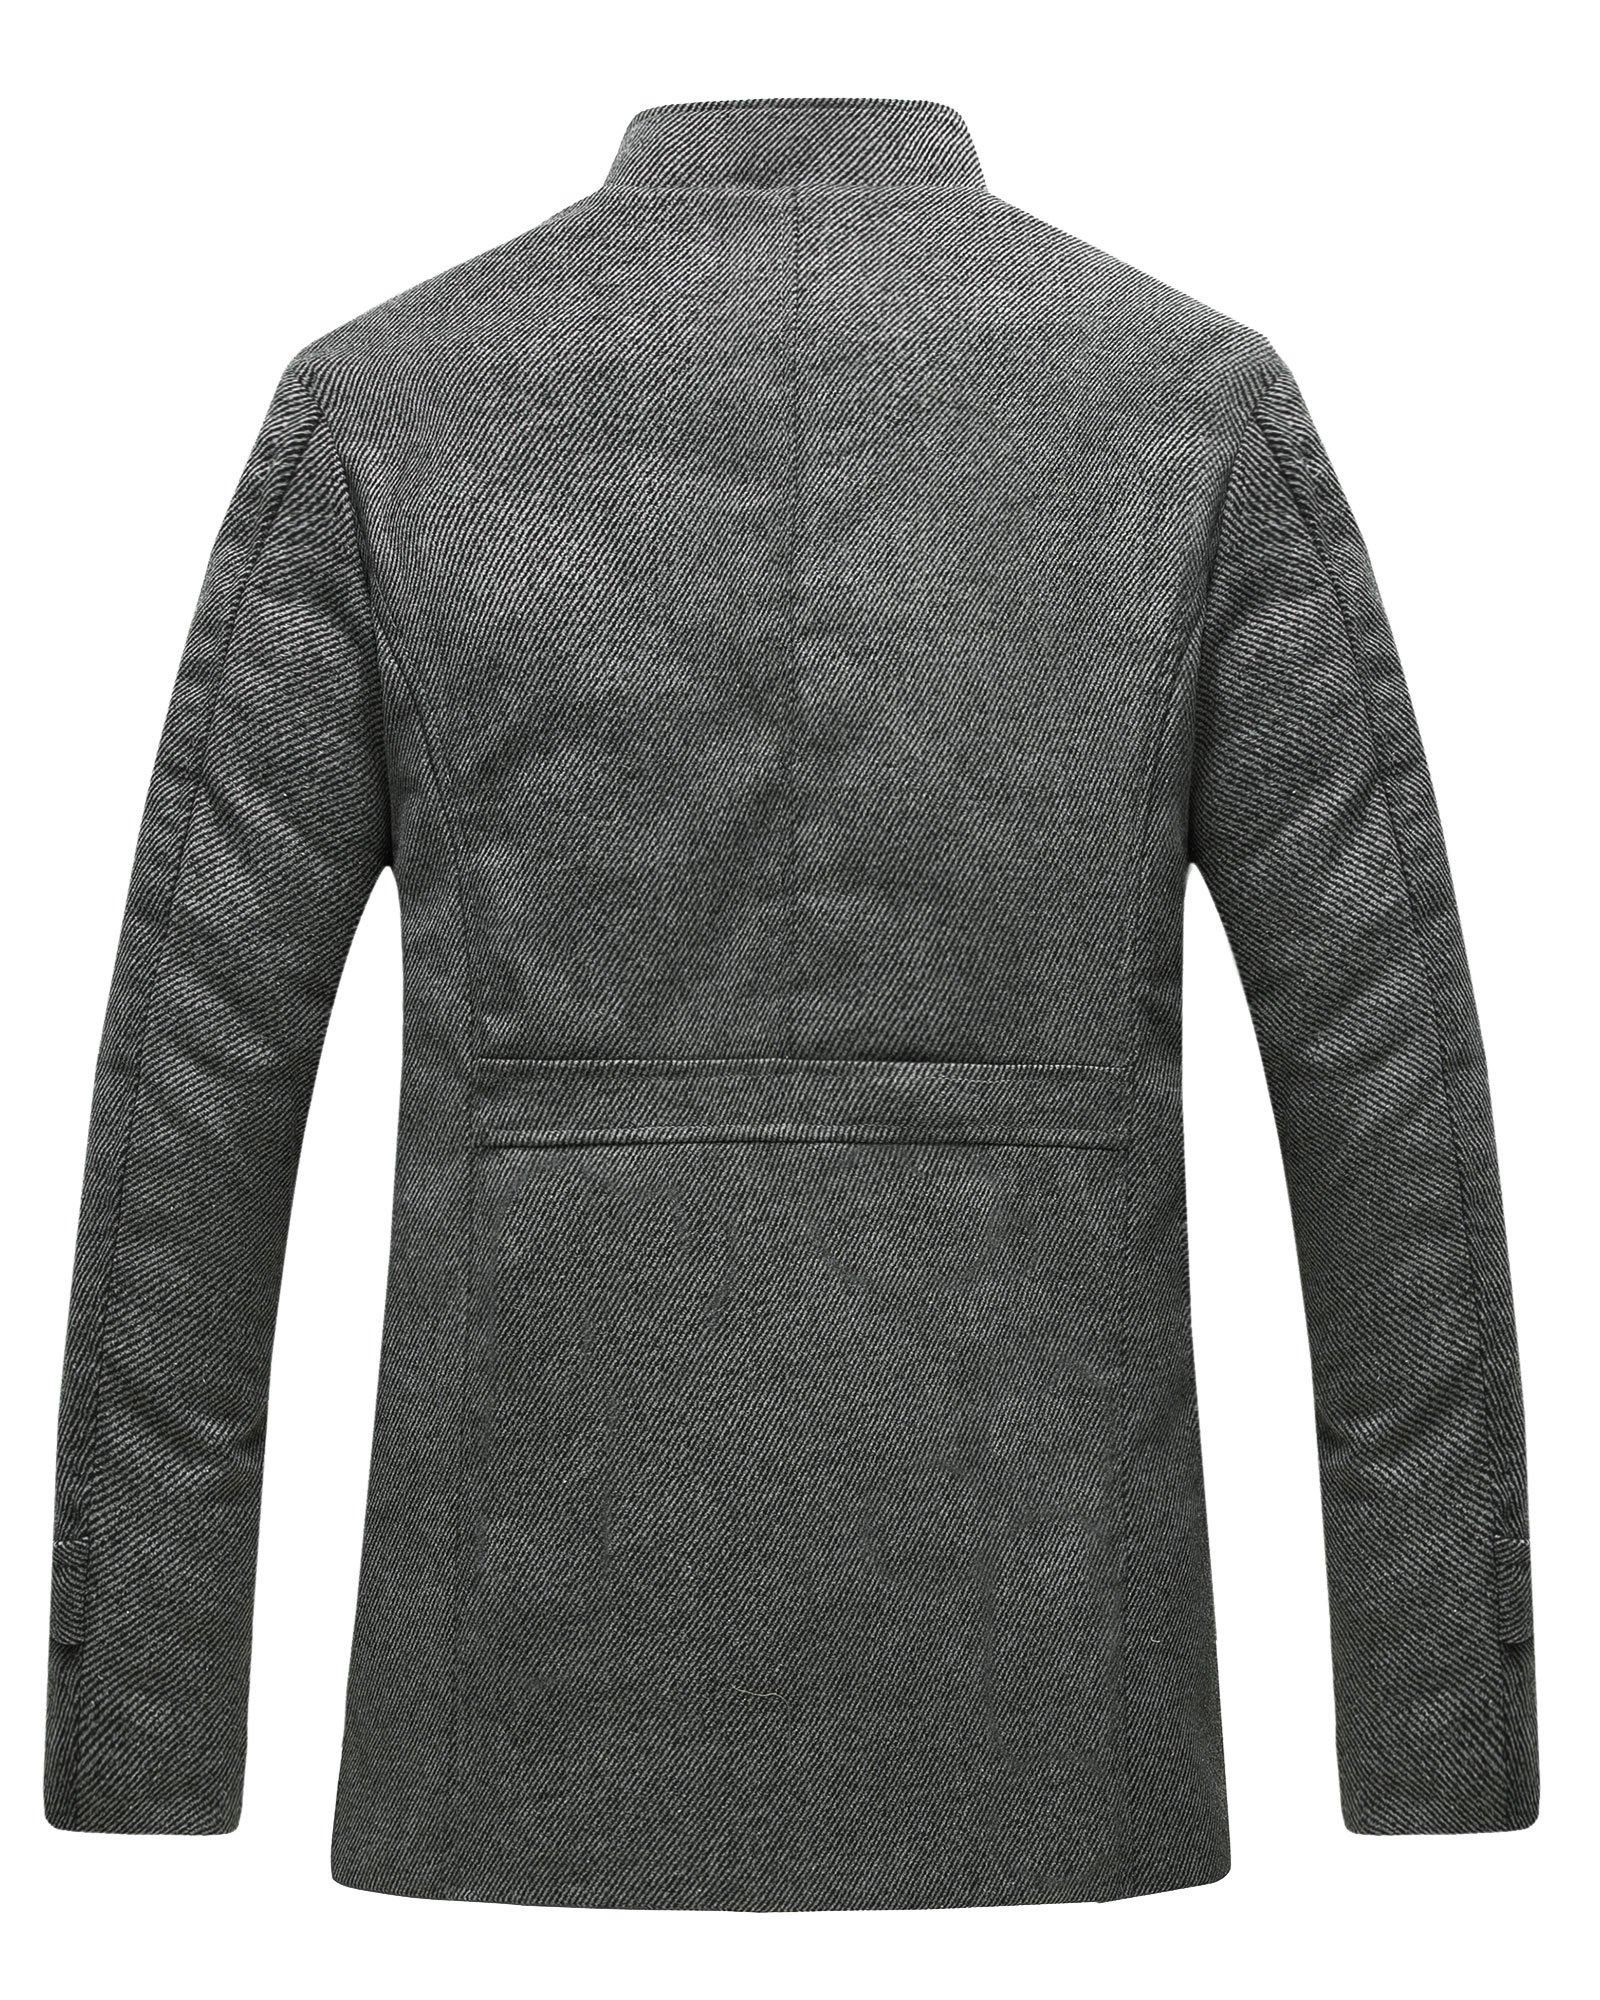 Wantdo Men's Wool Coat Stand Collar Windproof Jacket Overcoat Grey Large by Wantdo (Image #2)